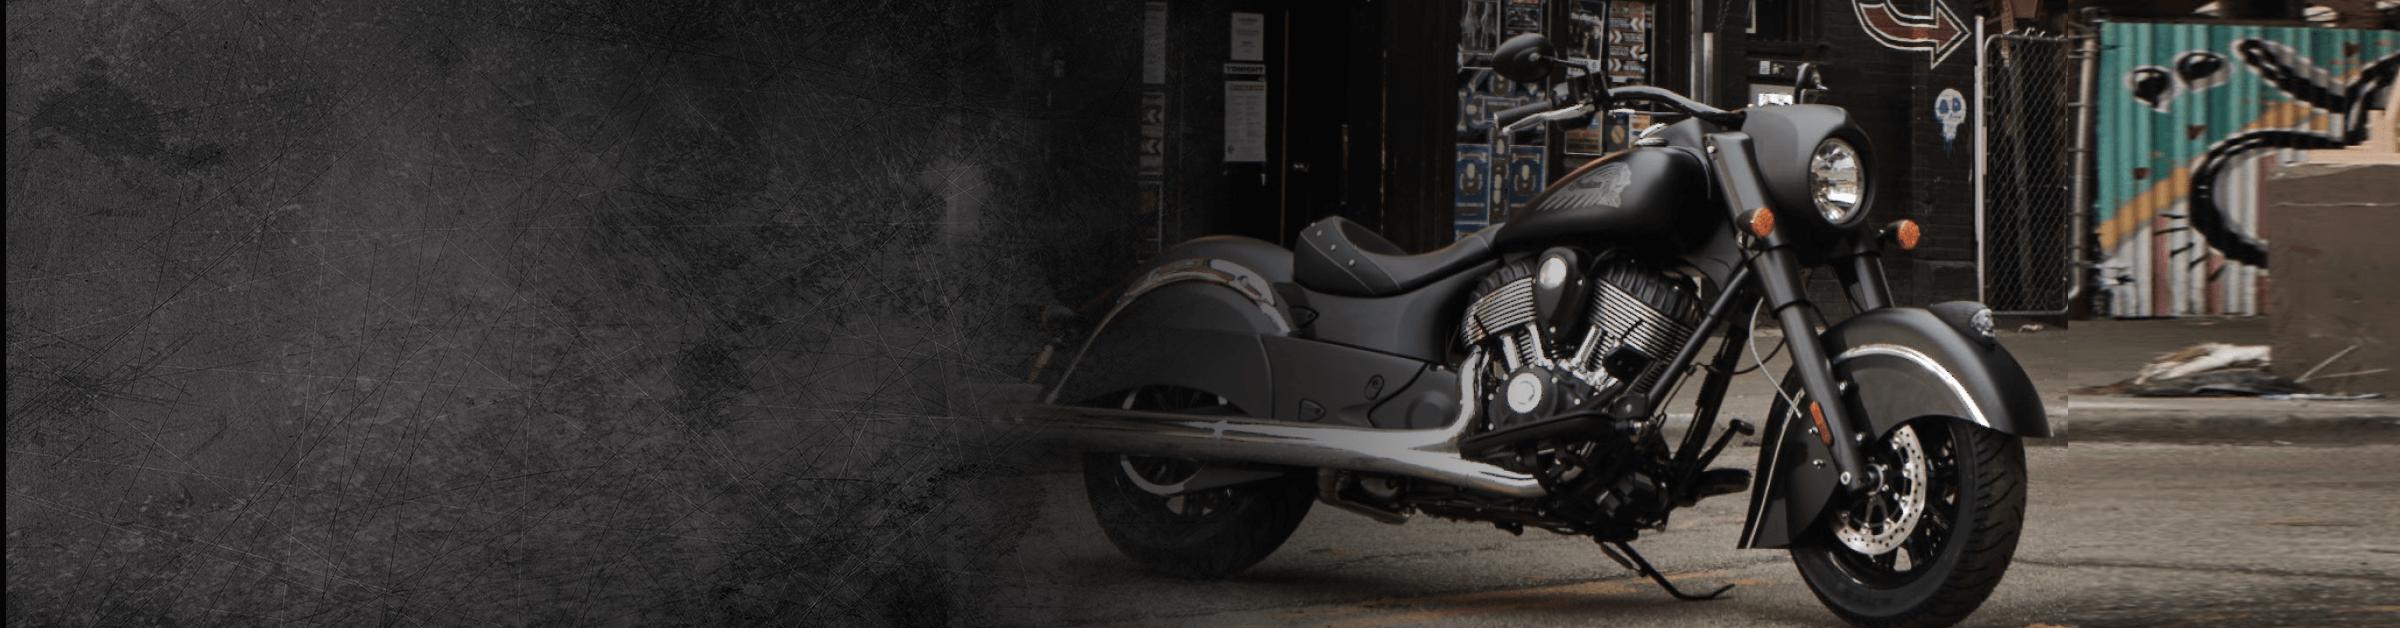 Chief Dark Horse Indian Motorcycle